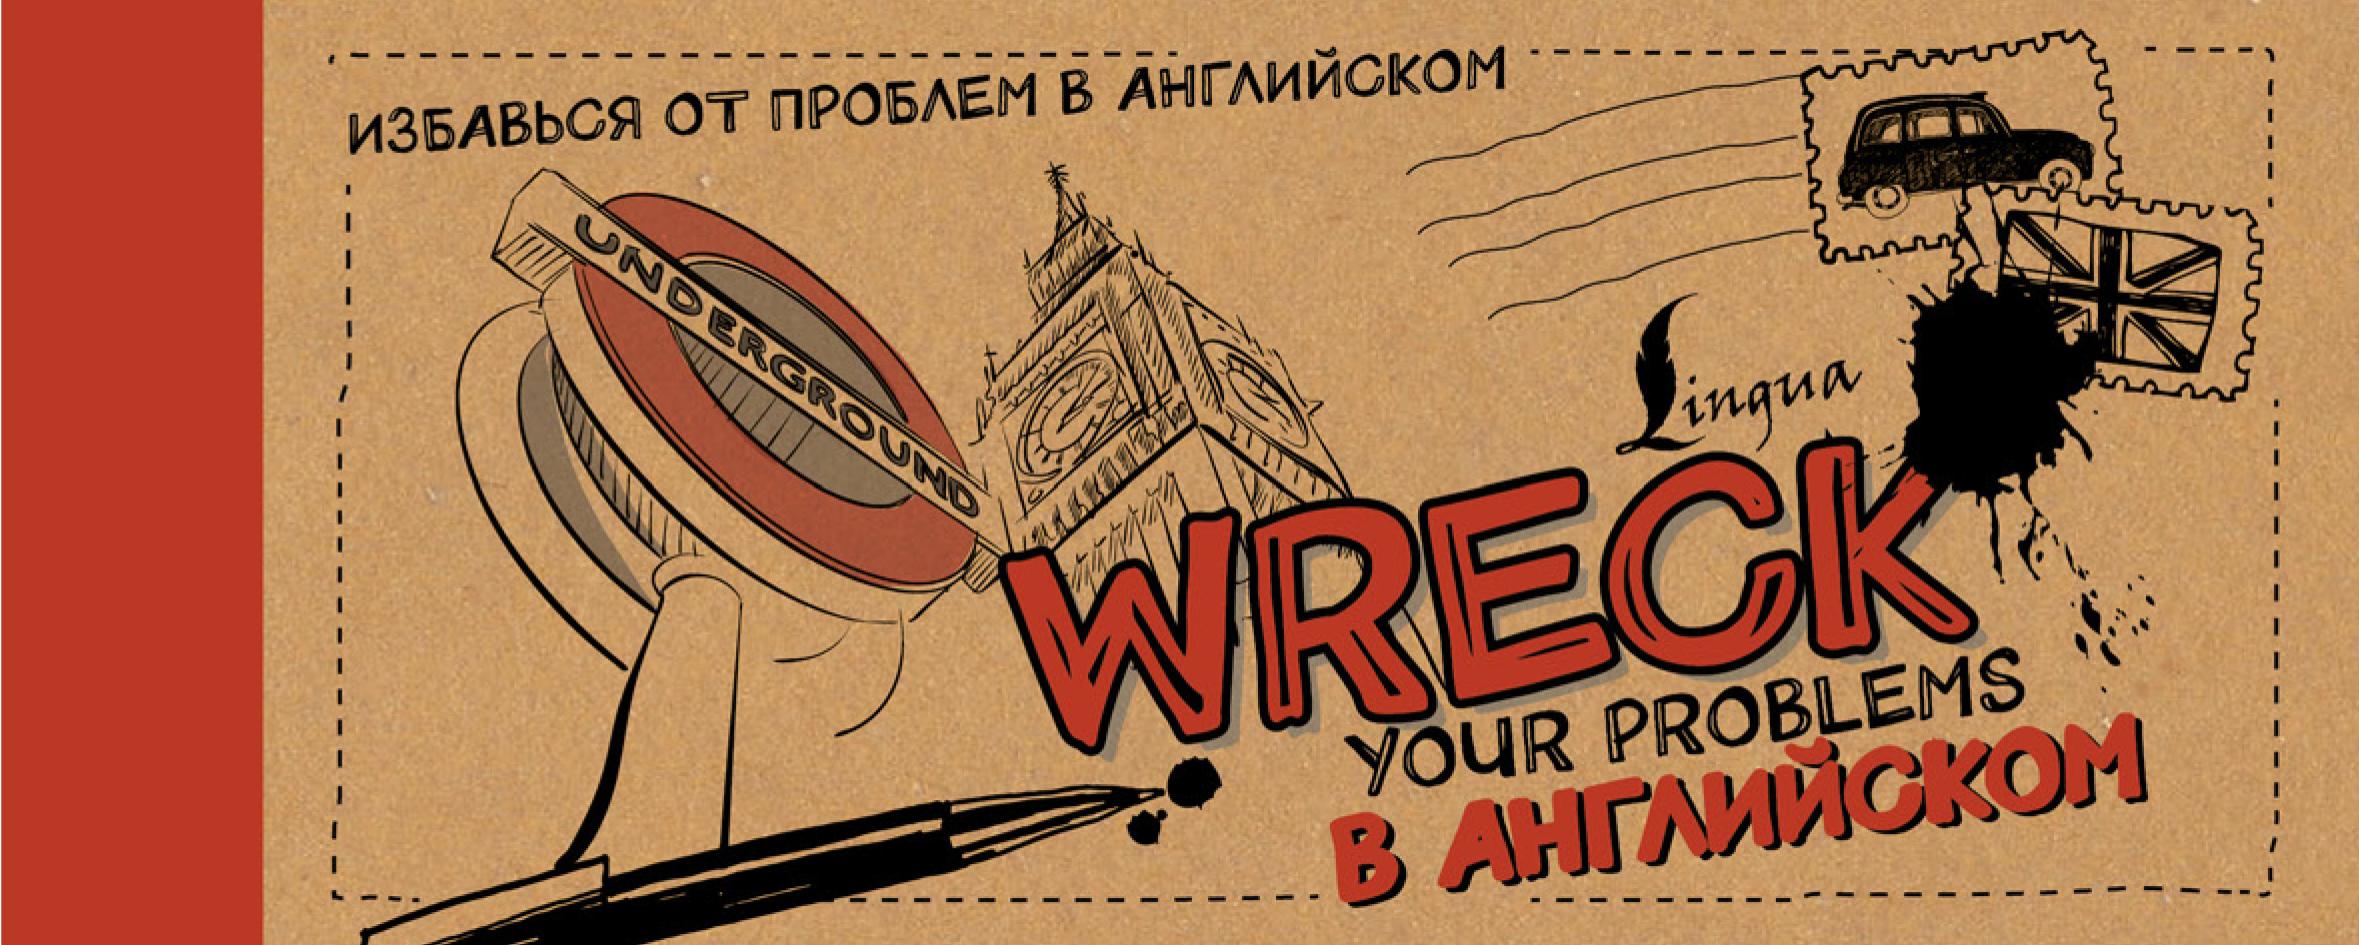 Wreck your problems в английском от book24.ru